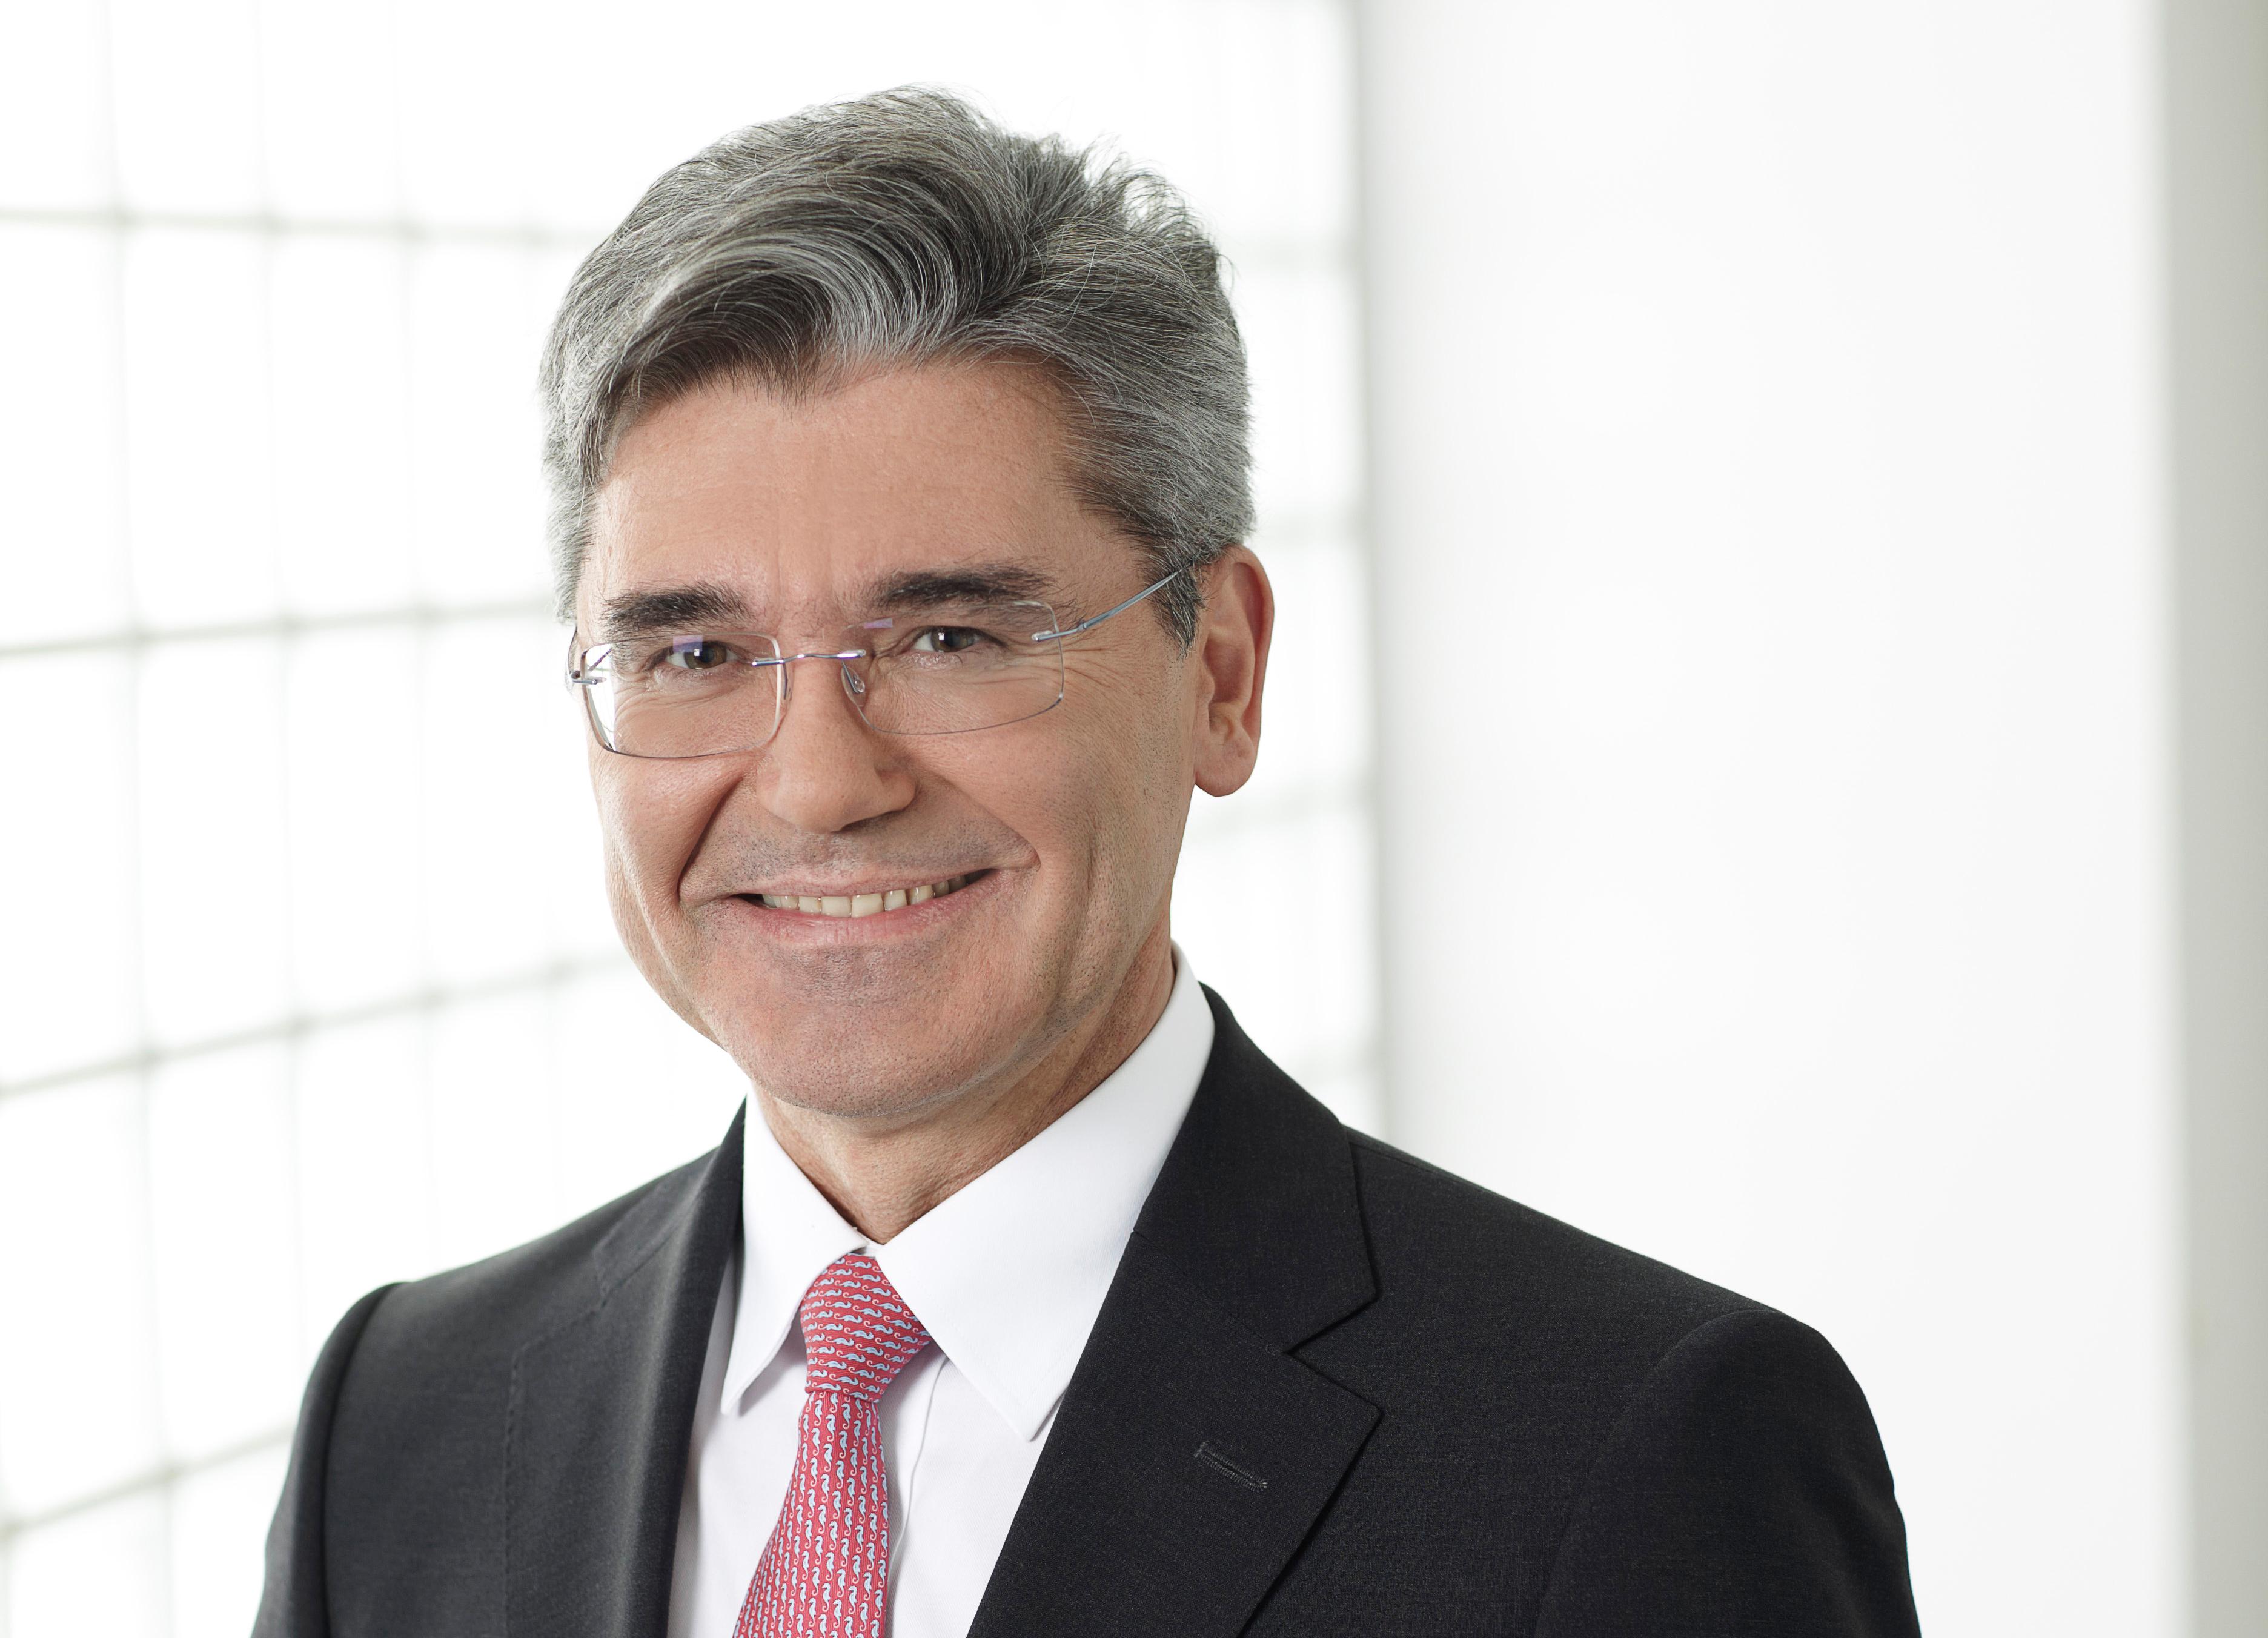 Joe Kaiser, president and CEO of Siemens